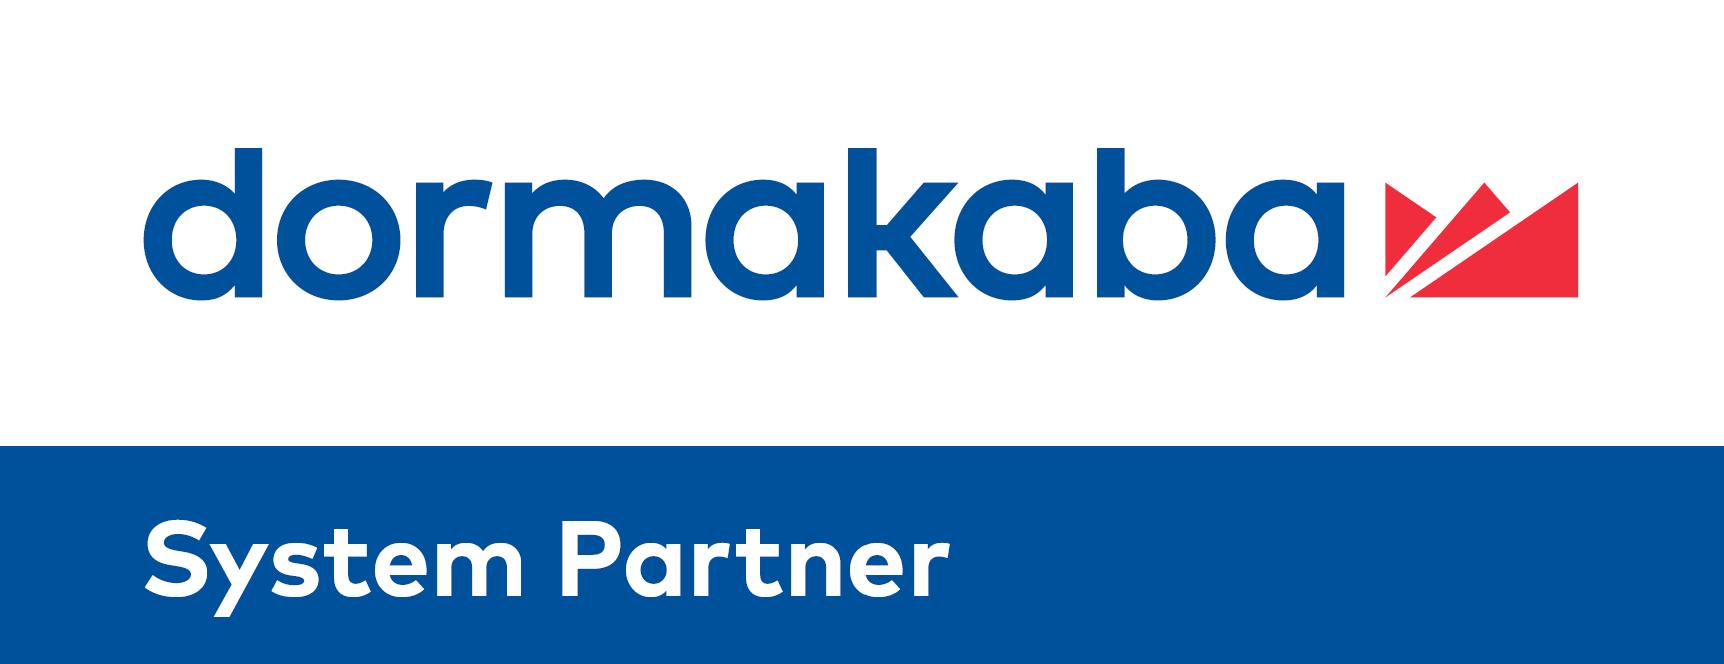 dormakaba system partner logo